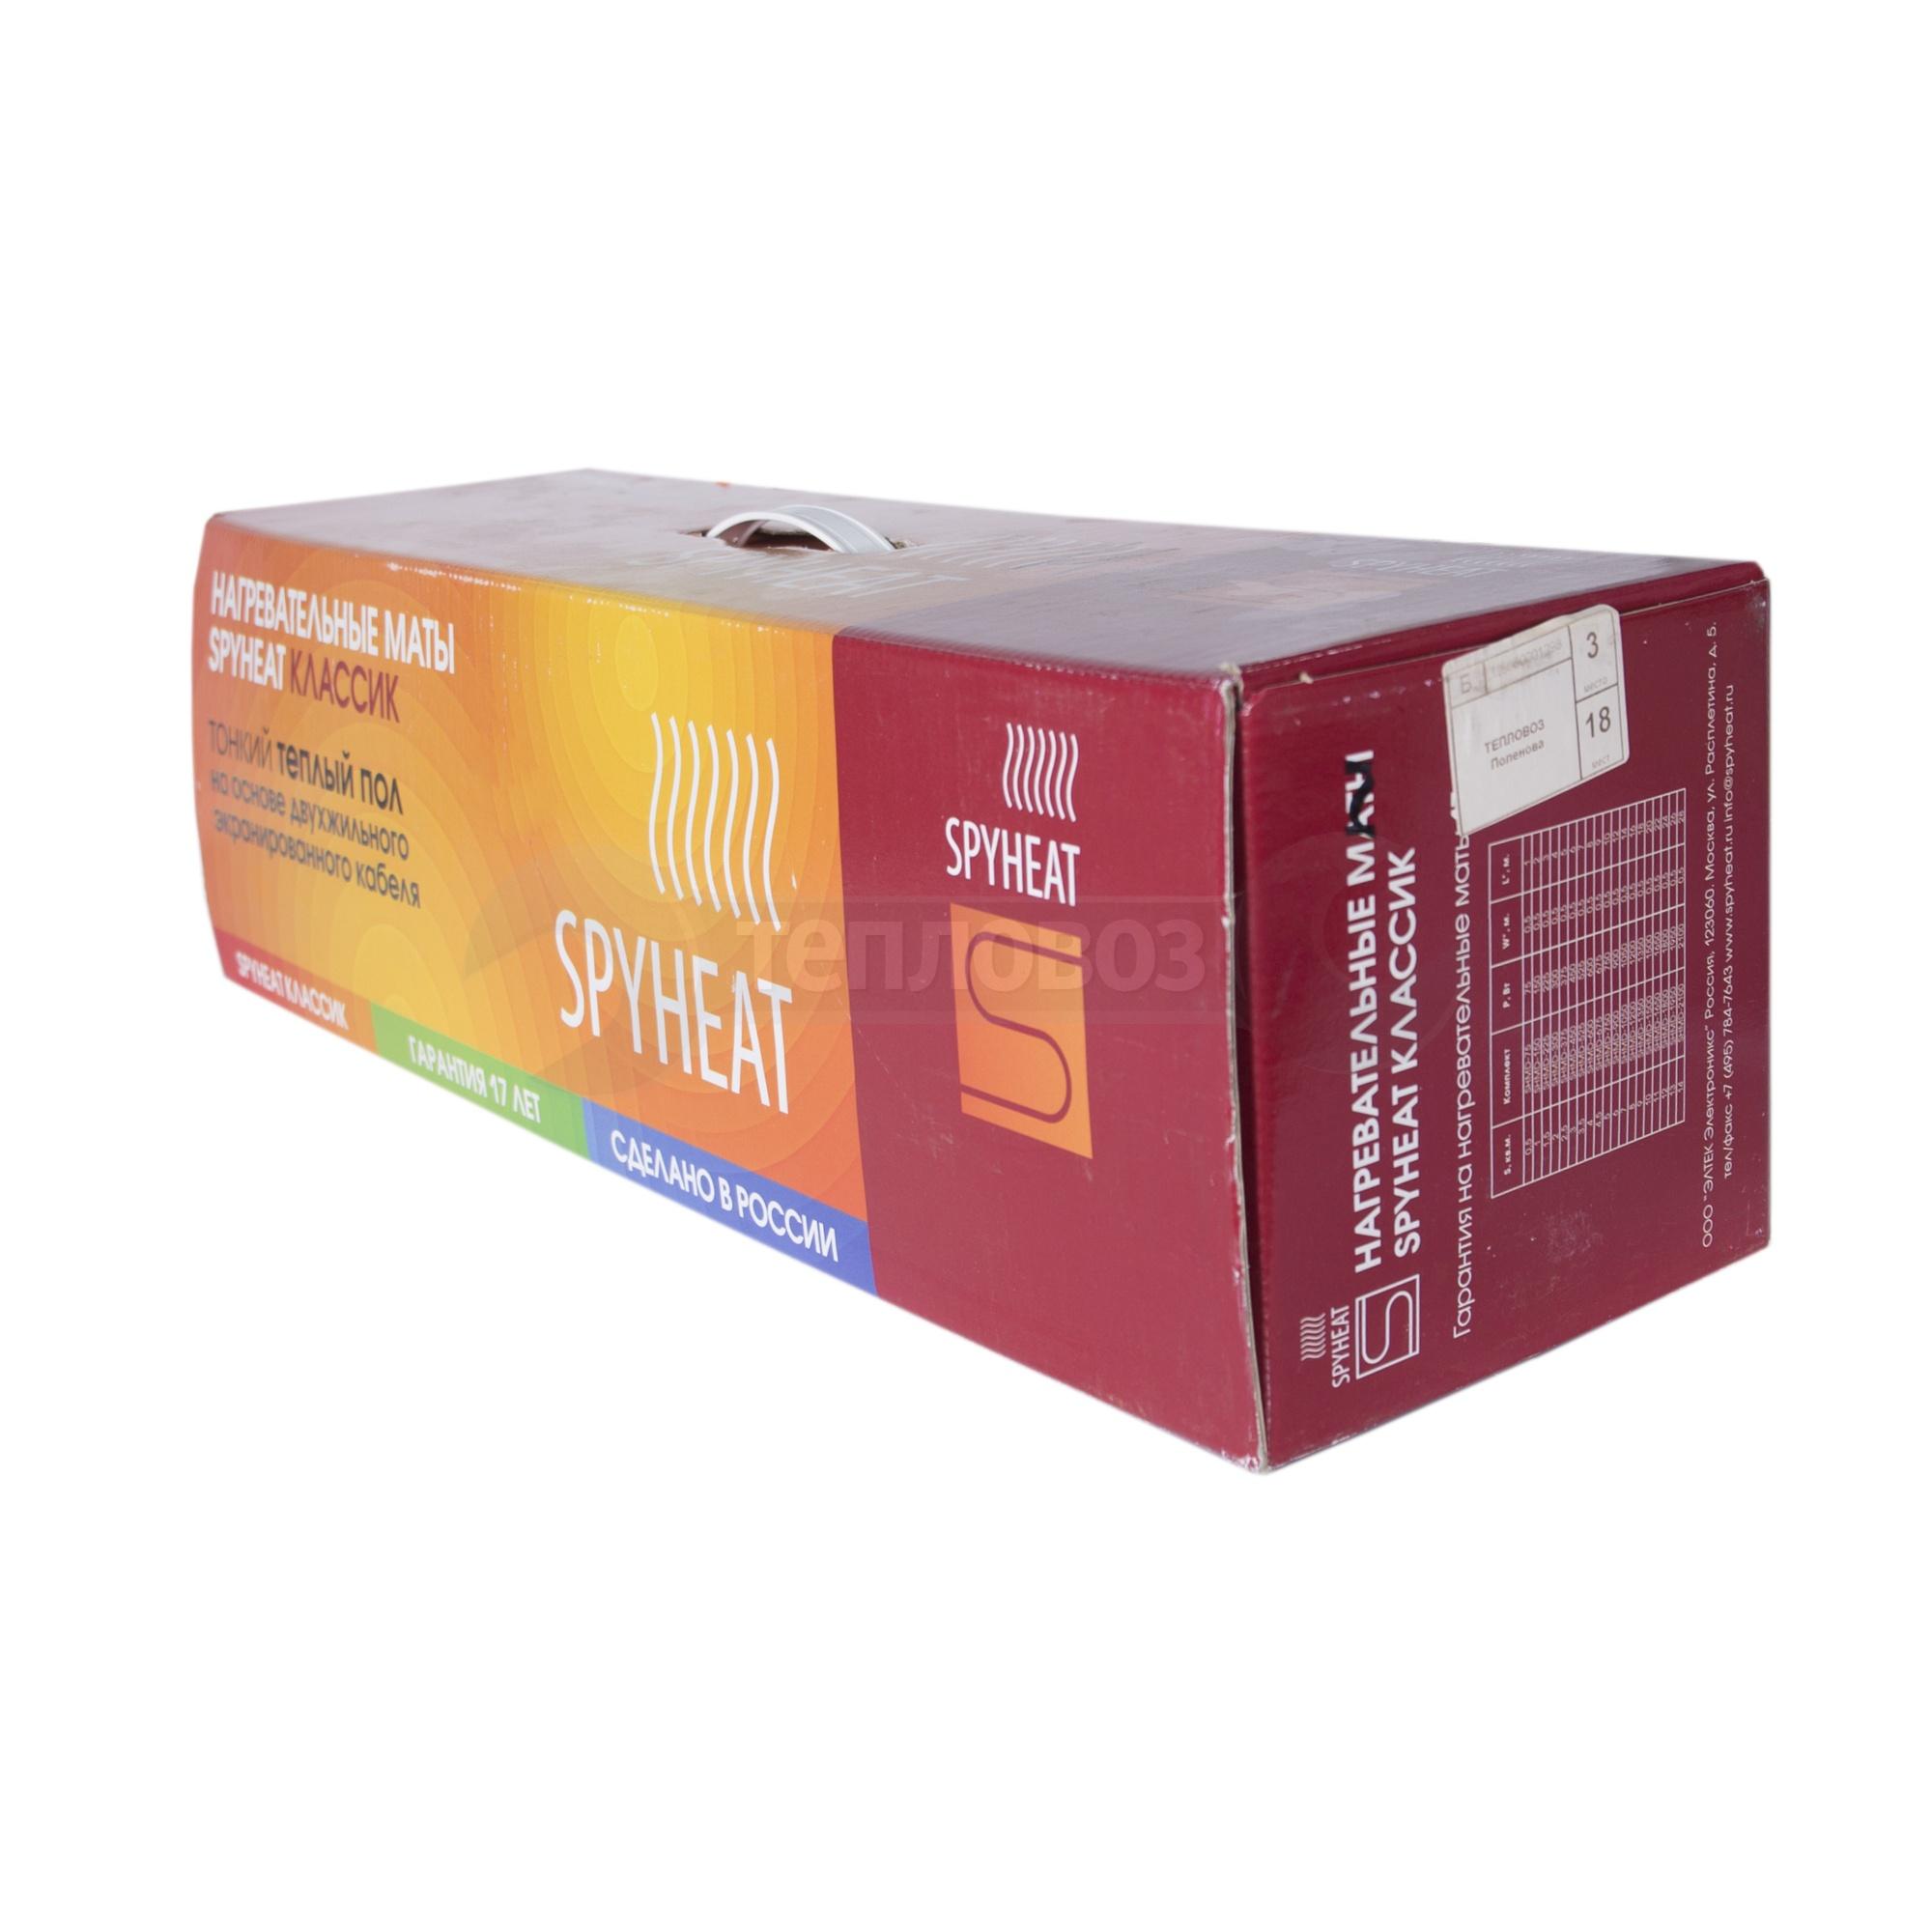 Spyheat Shмd - 8-450 Вт